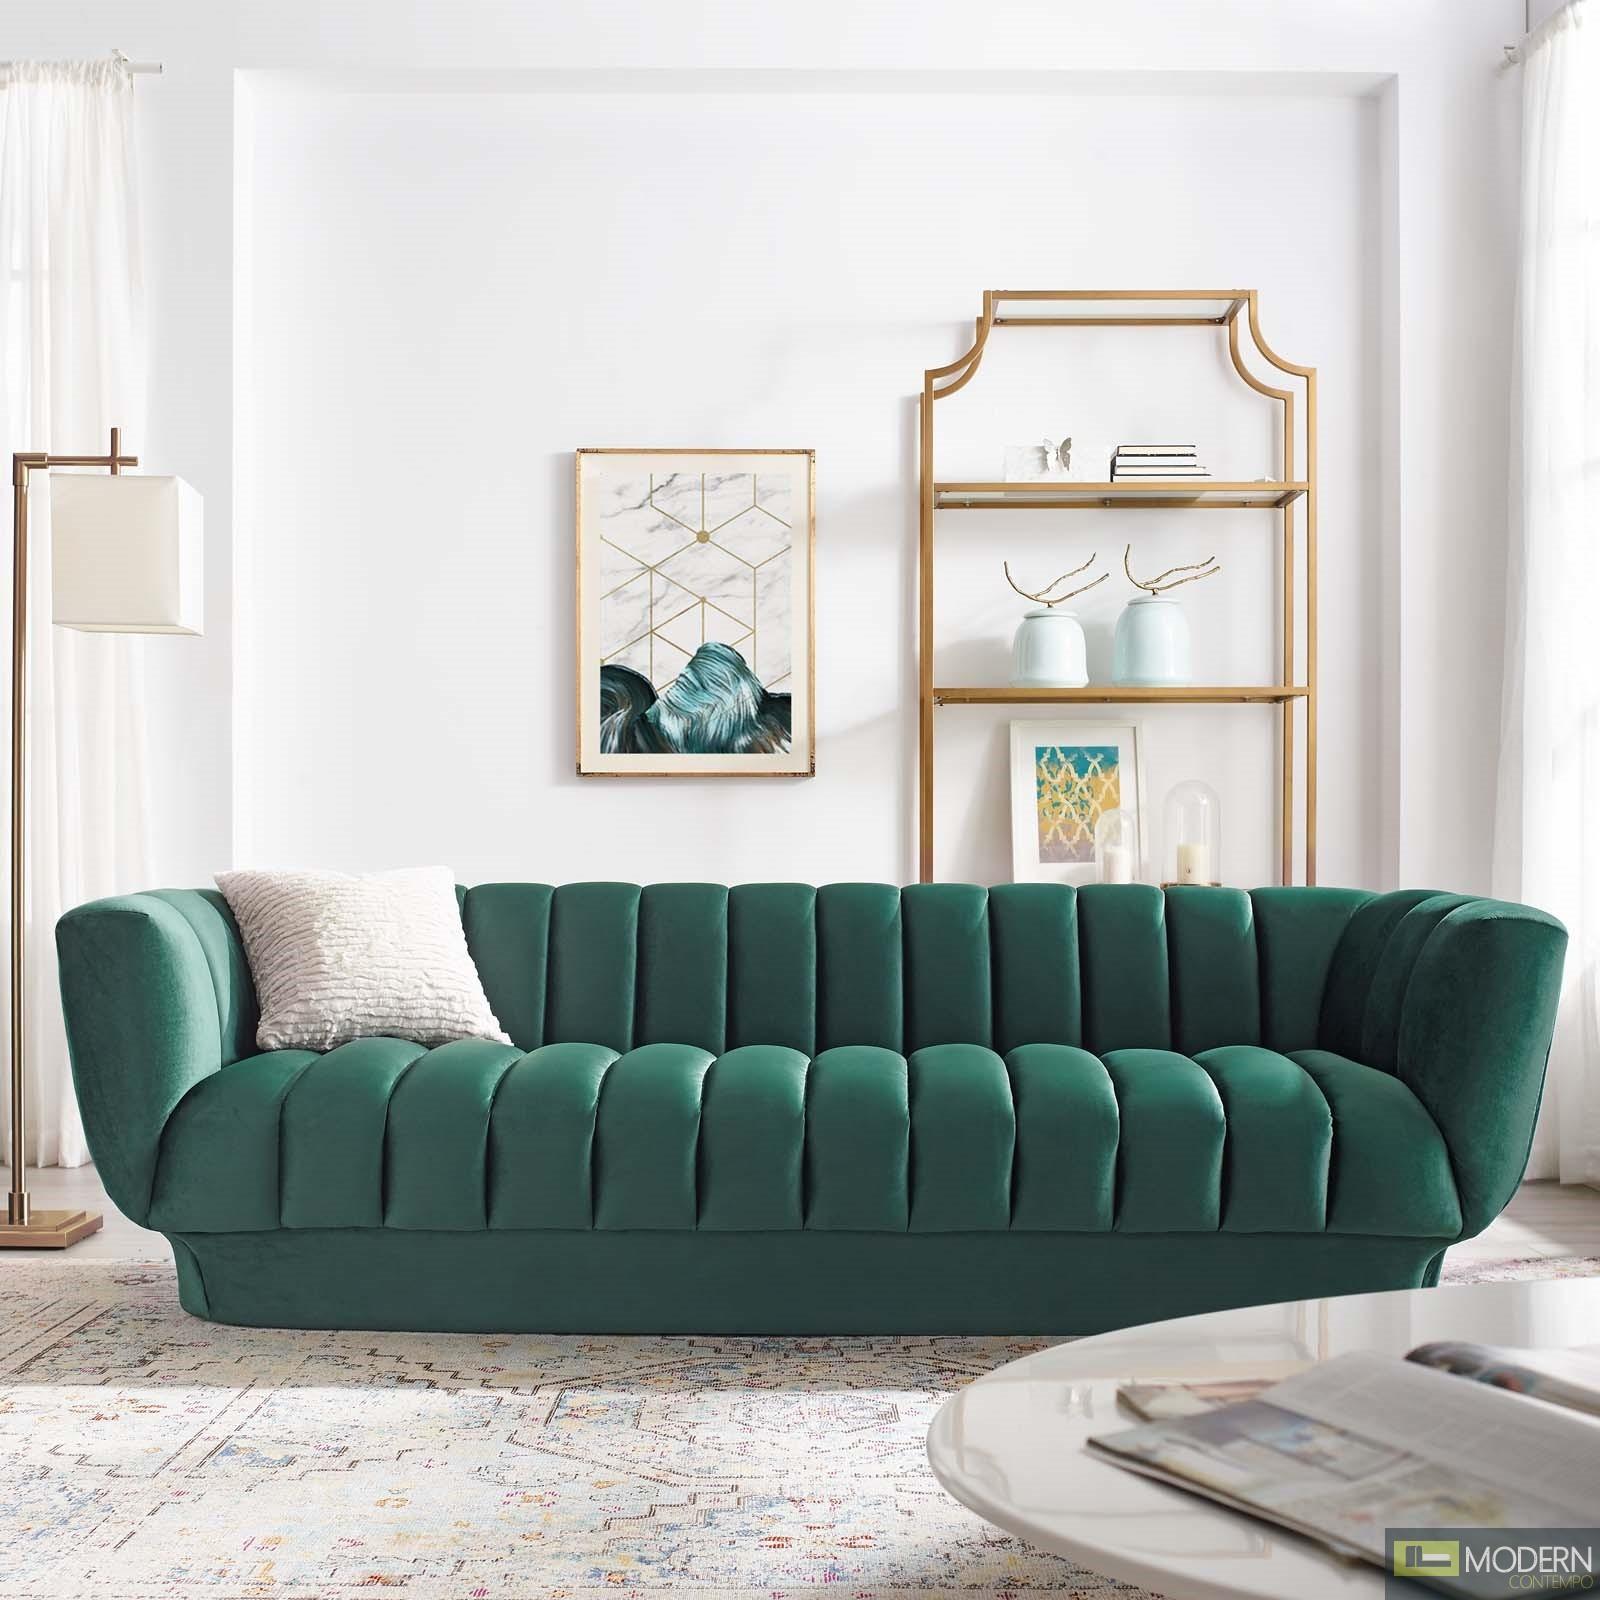 Excellent Chiara Vertical Channel Tufted Performance Velvet Sofa Pdpeps Interior Chair Design Pdpepsorg